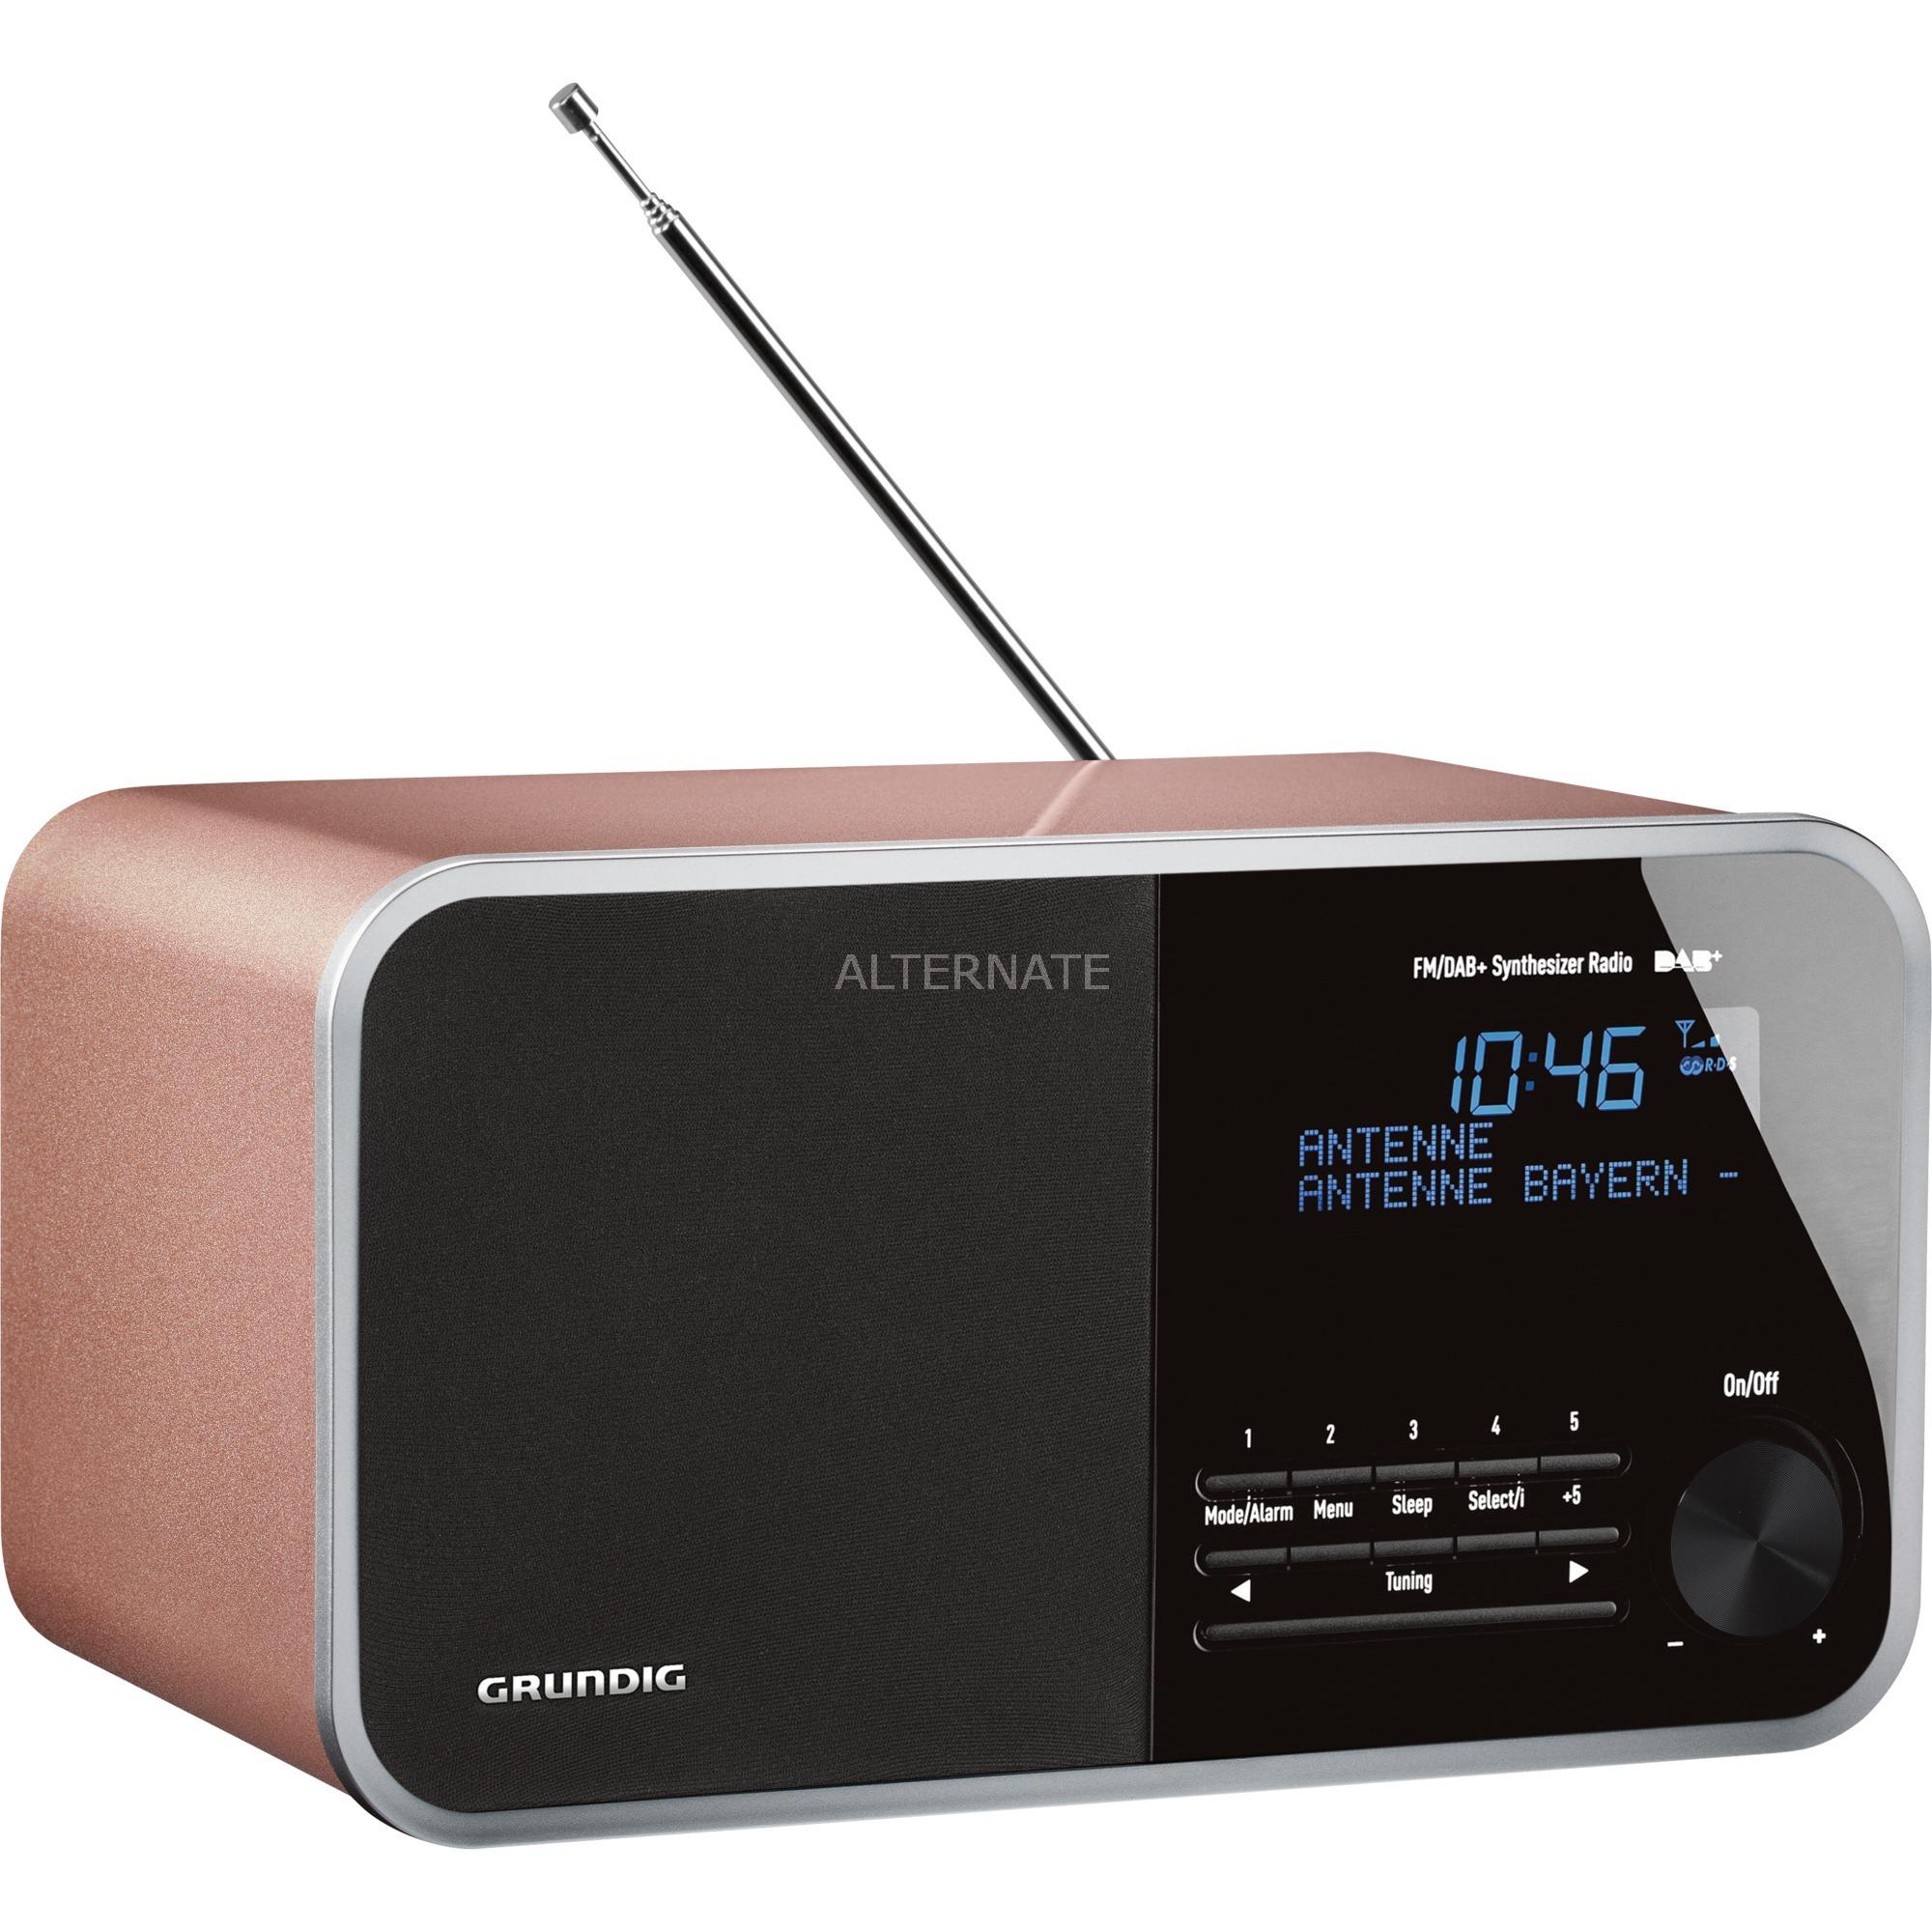 DTR 3000 DAB+ radio Personal Analógico y digital Oro rosado